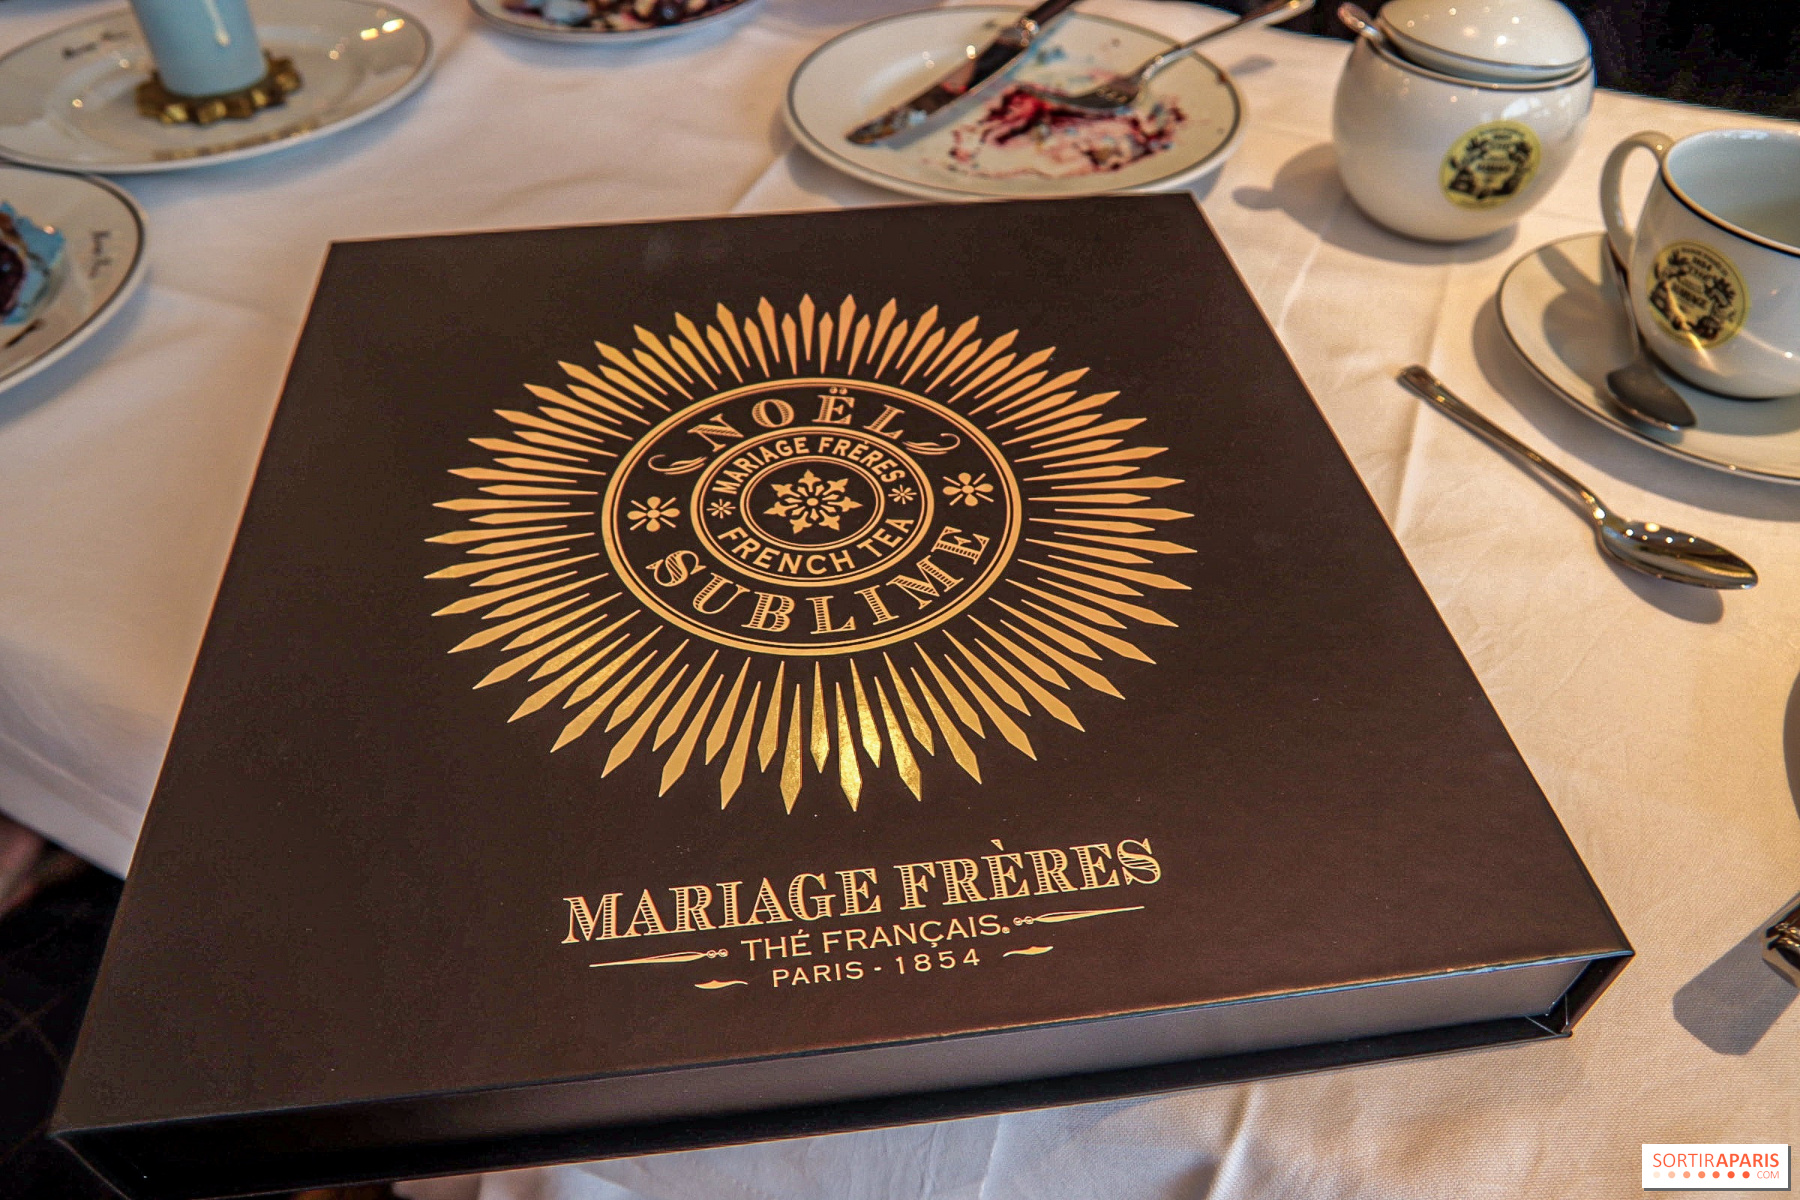 Calendrier Avant Mariage.Buches Et Thes De Noel Mariage Freres 2019 Sortiraparis Com